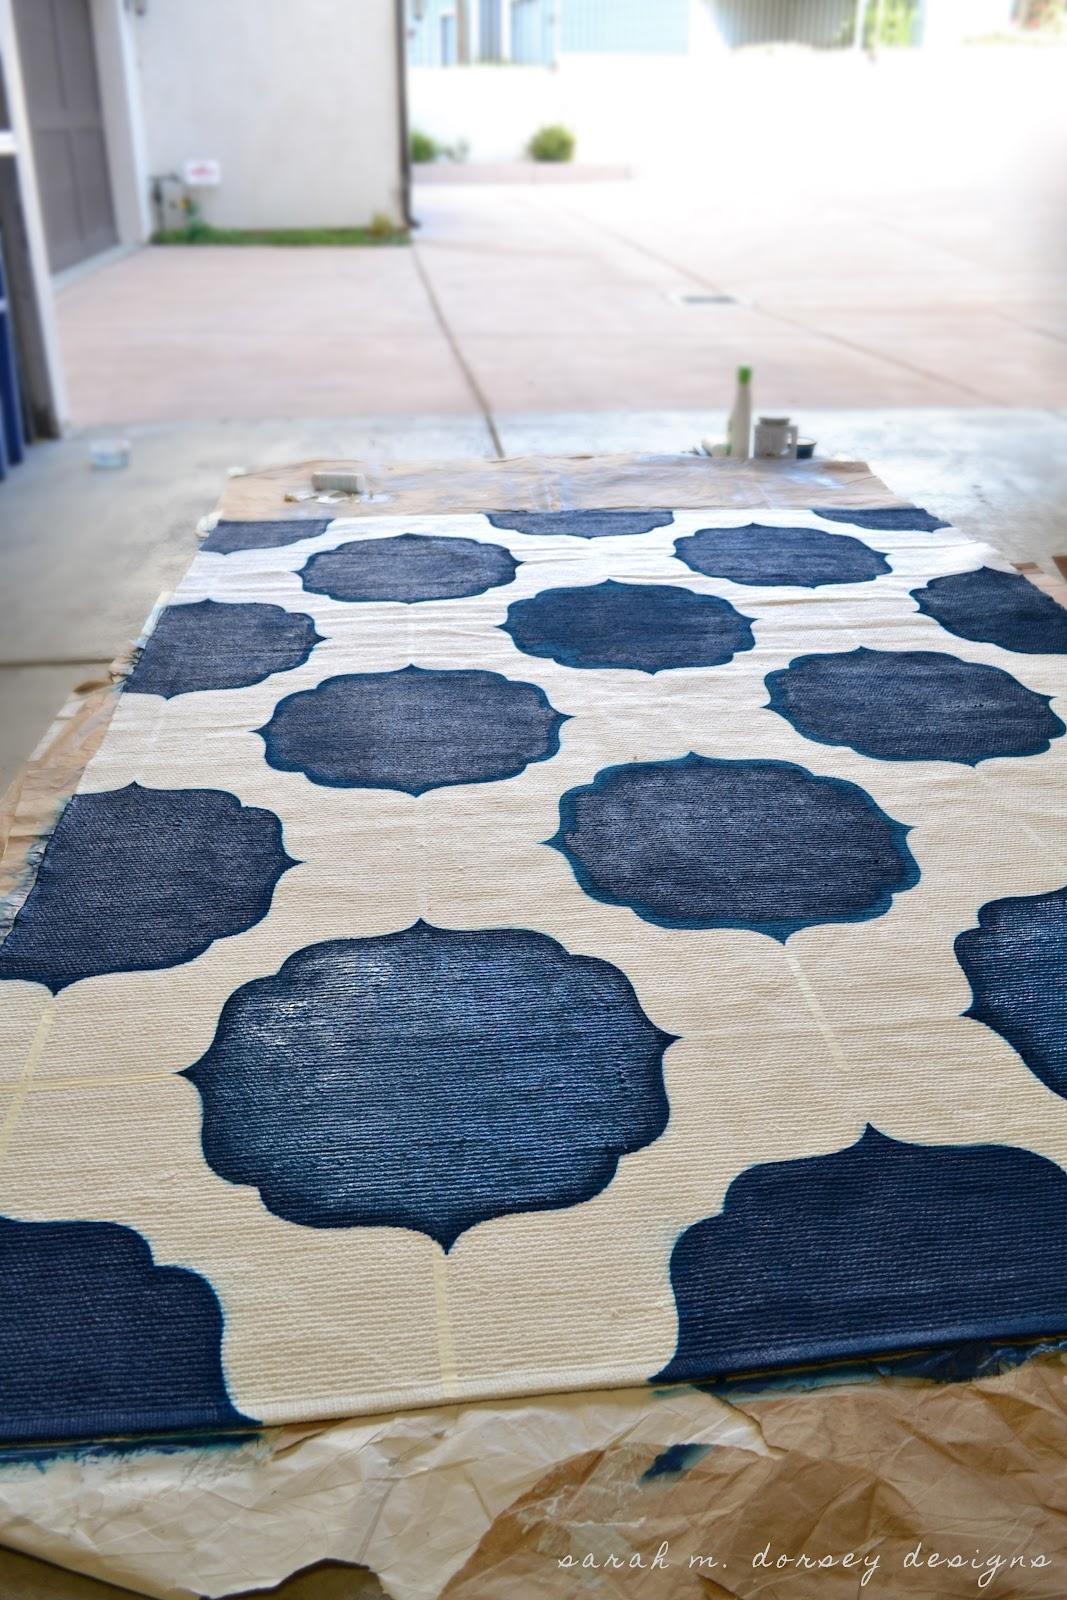 Sarah M Dorsey Designs Diy Painted Morrocan Rug Finished